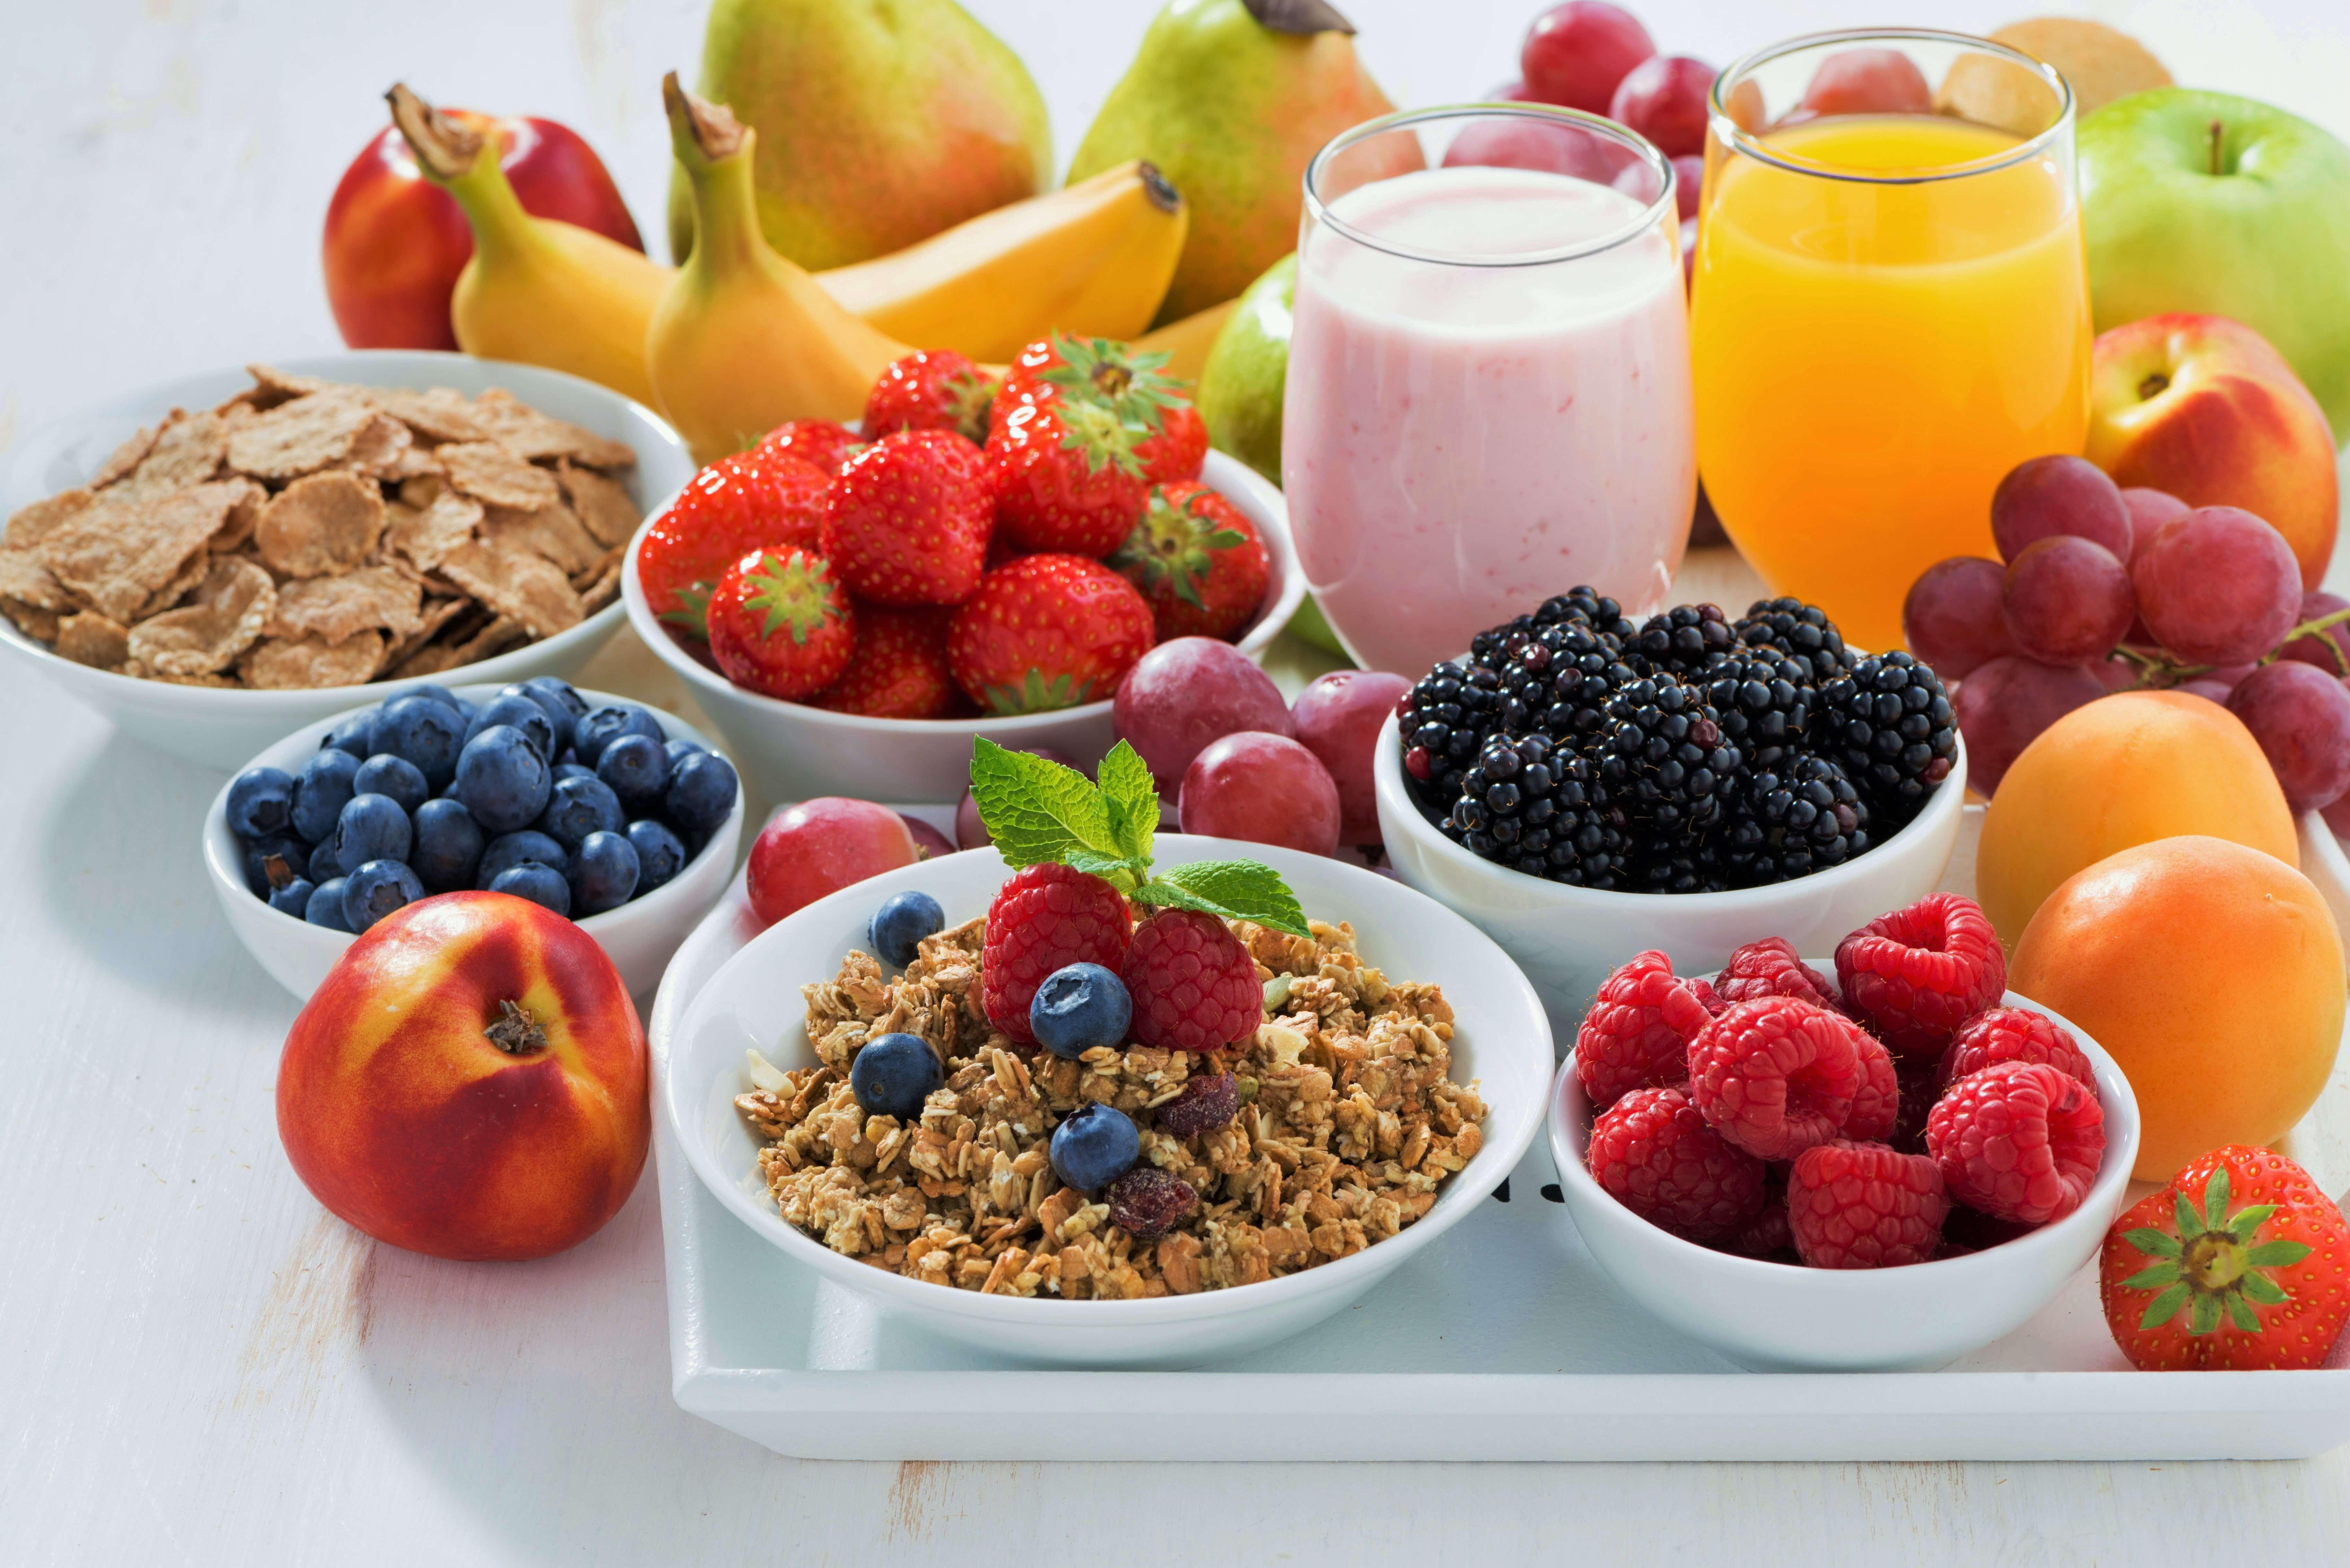 Healthy Breakfest